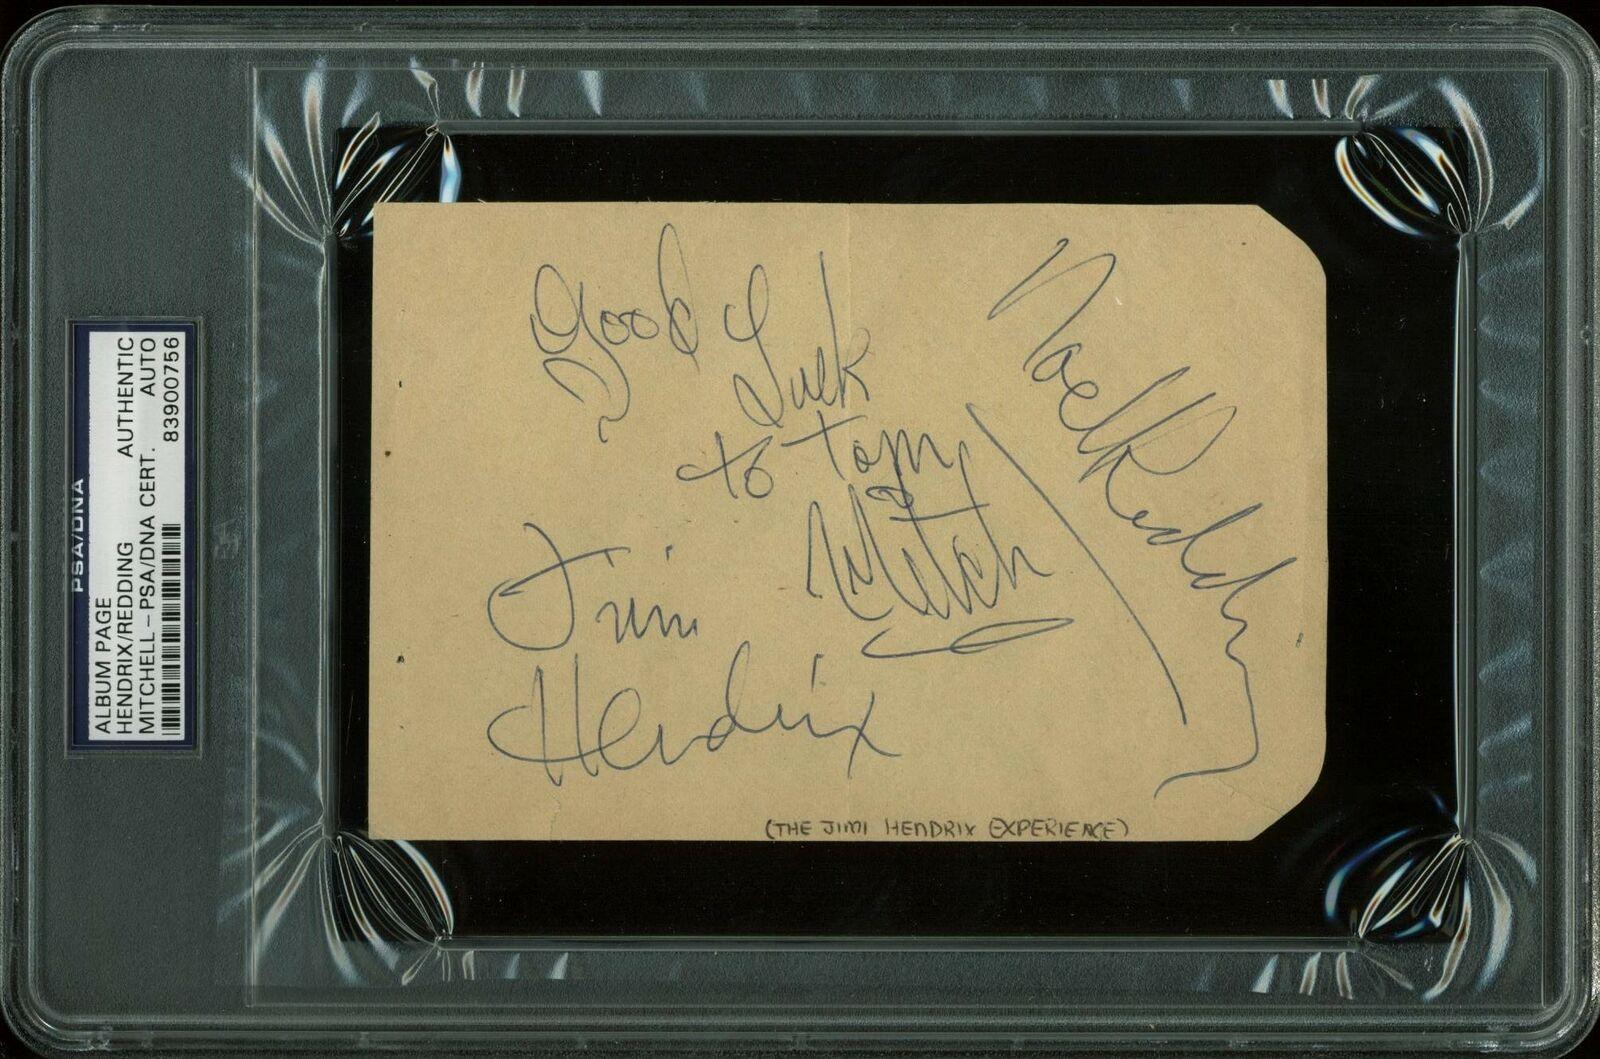 Jimi Hendrix Experience (Hendrix, Mitchell & Redding) Signed 4x6 Album Page PSA